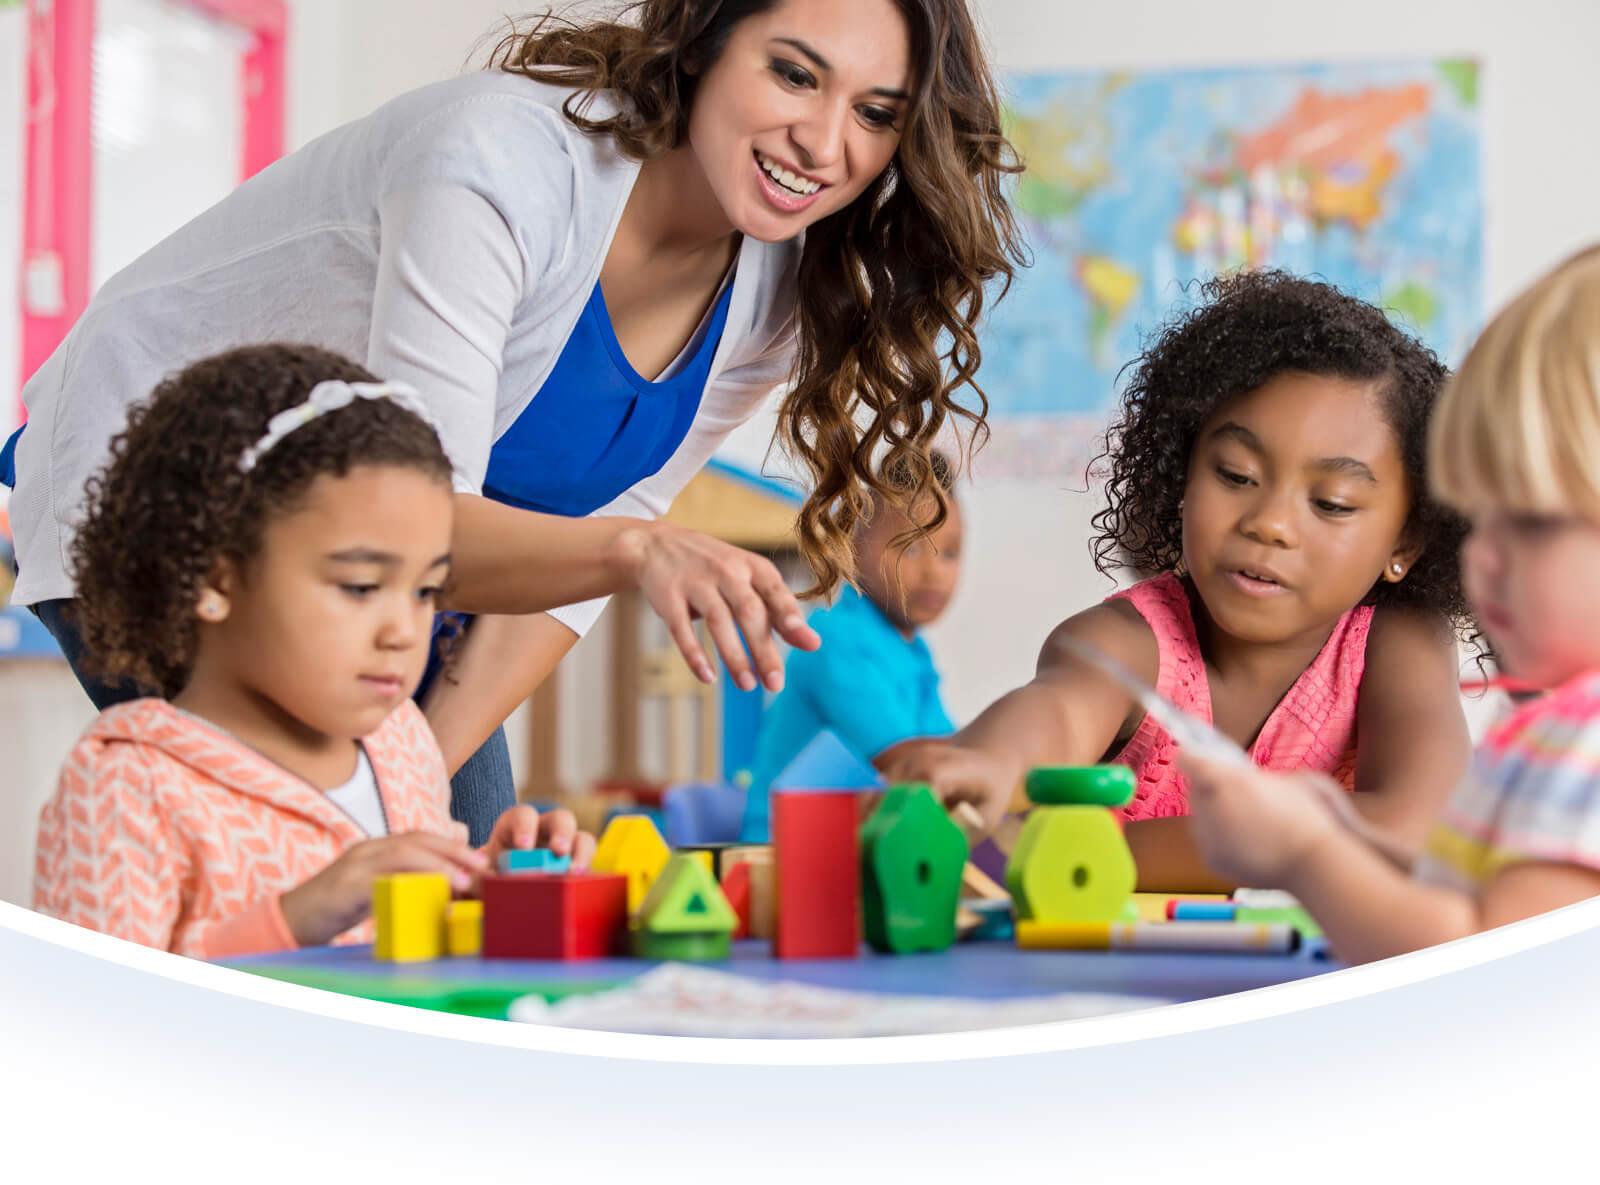 Female teacher helping students